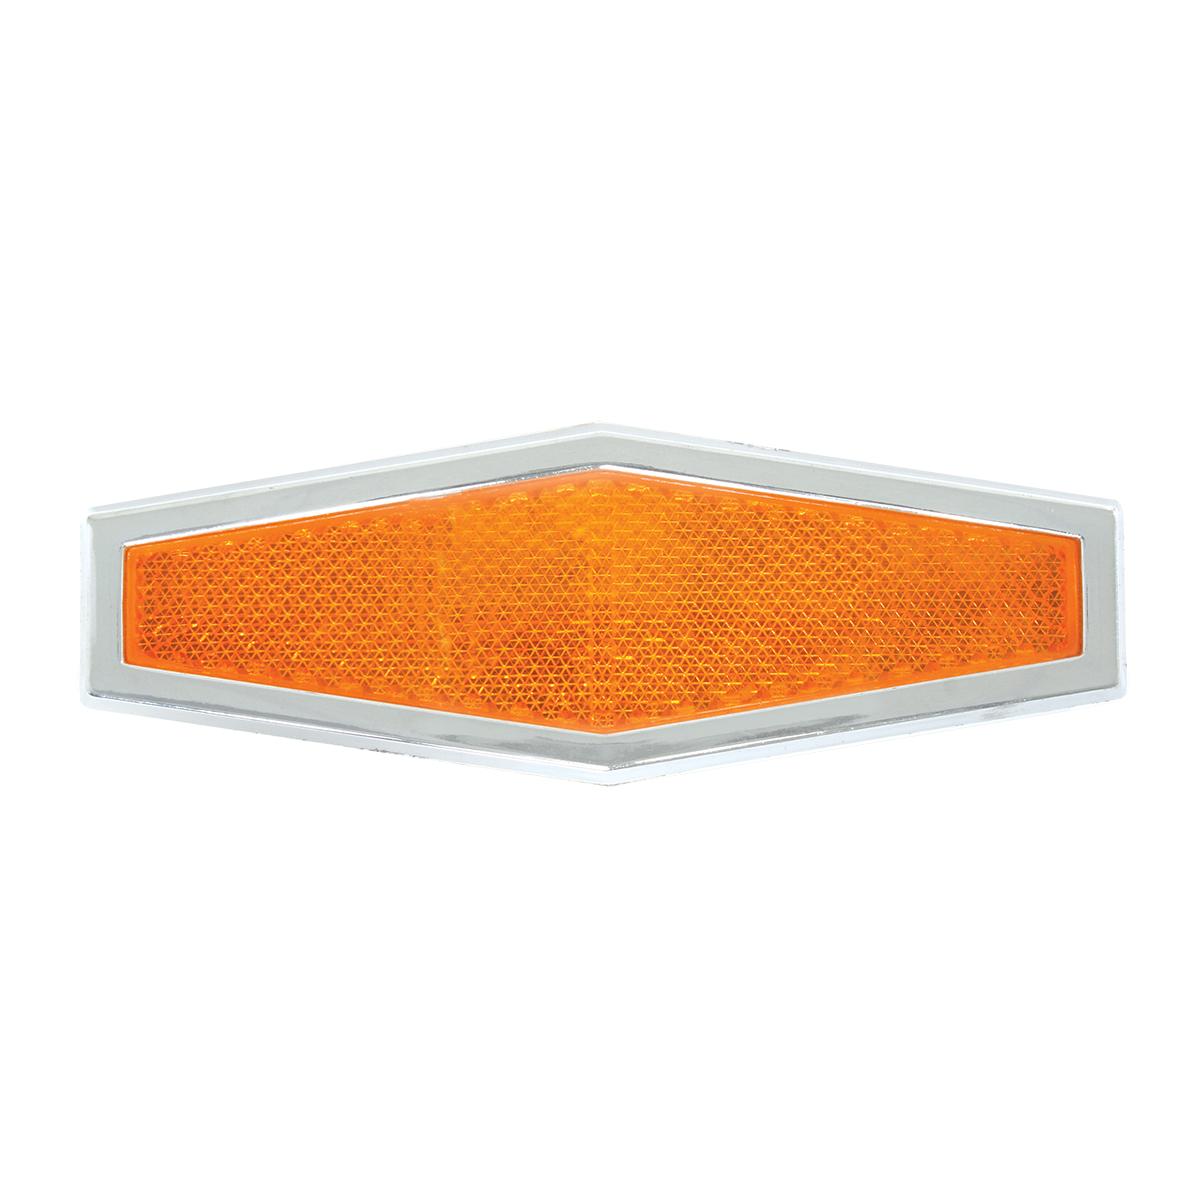 80861 Amber Diamond Shape Stick-On Reflector w/ Chrome Trim